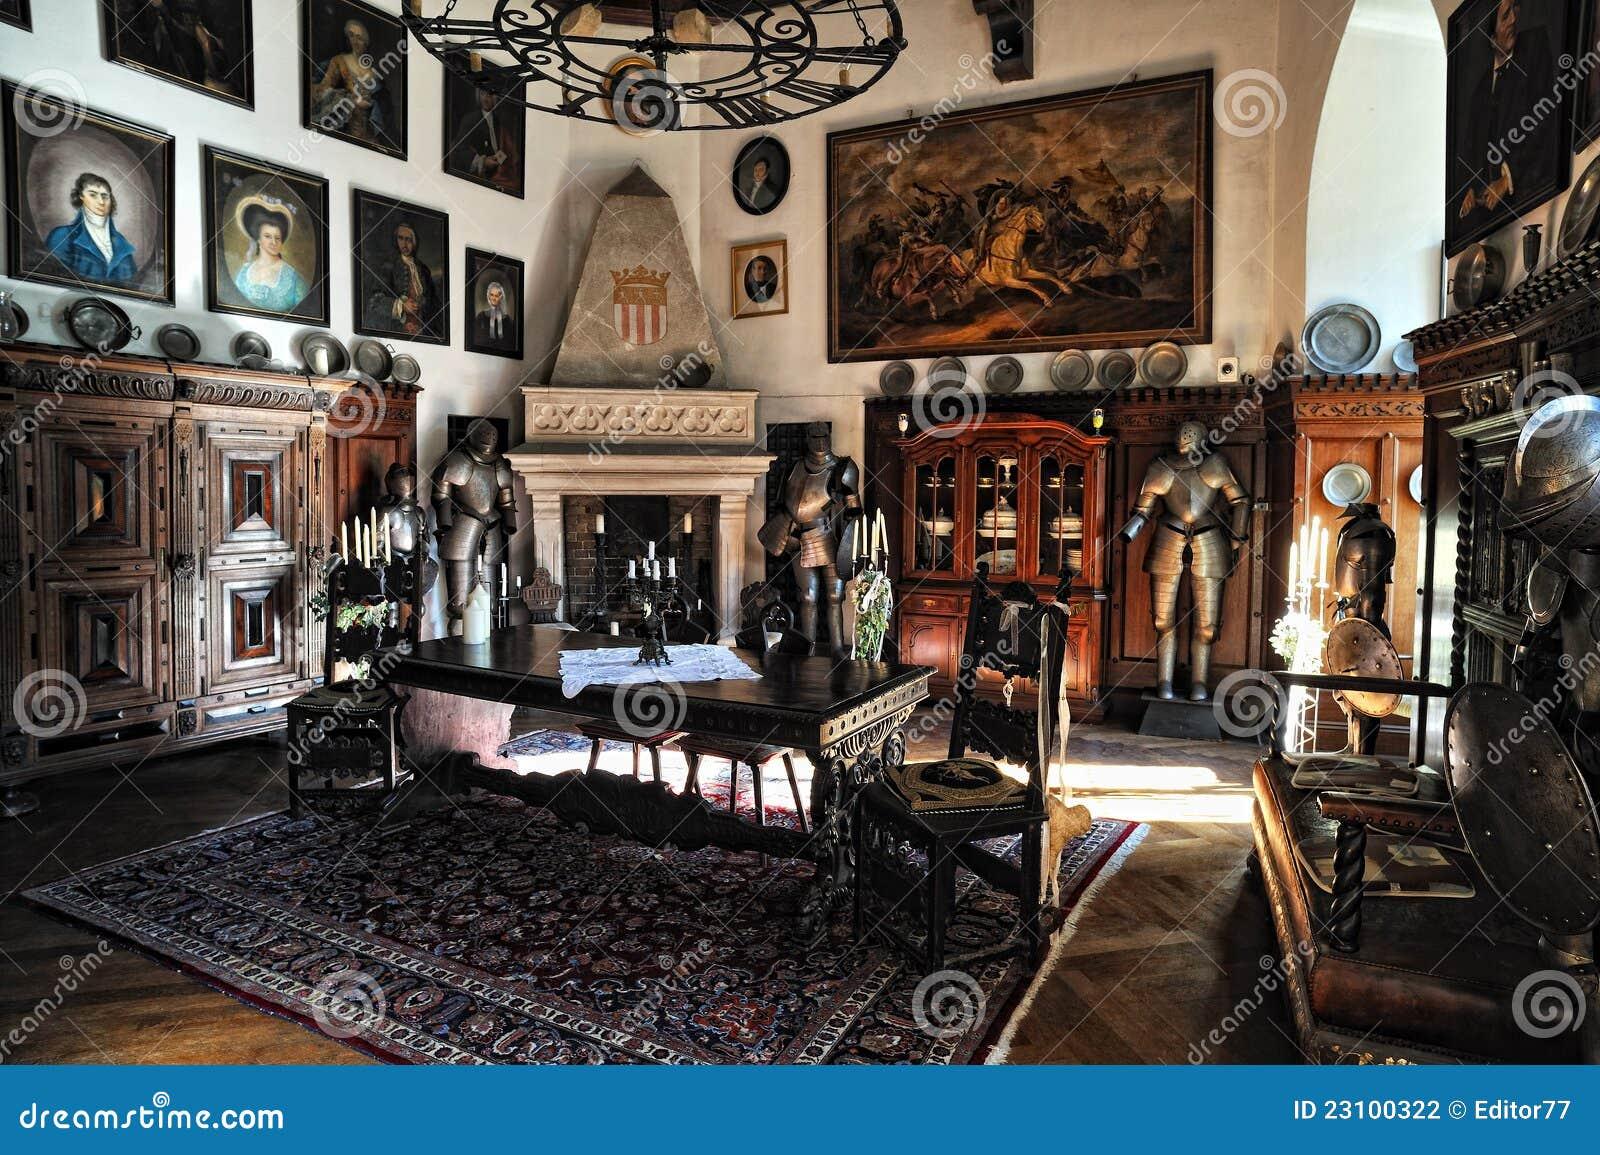 Reichenstein Castle Old Furniture In The Room Editorial